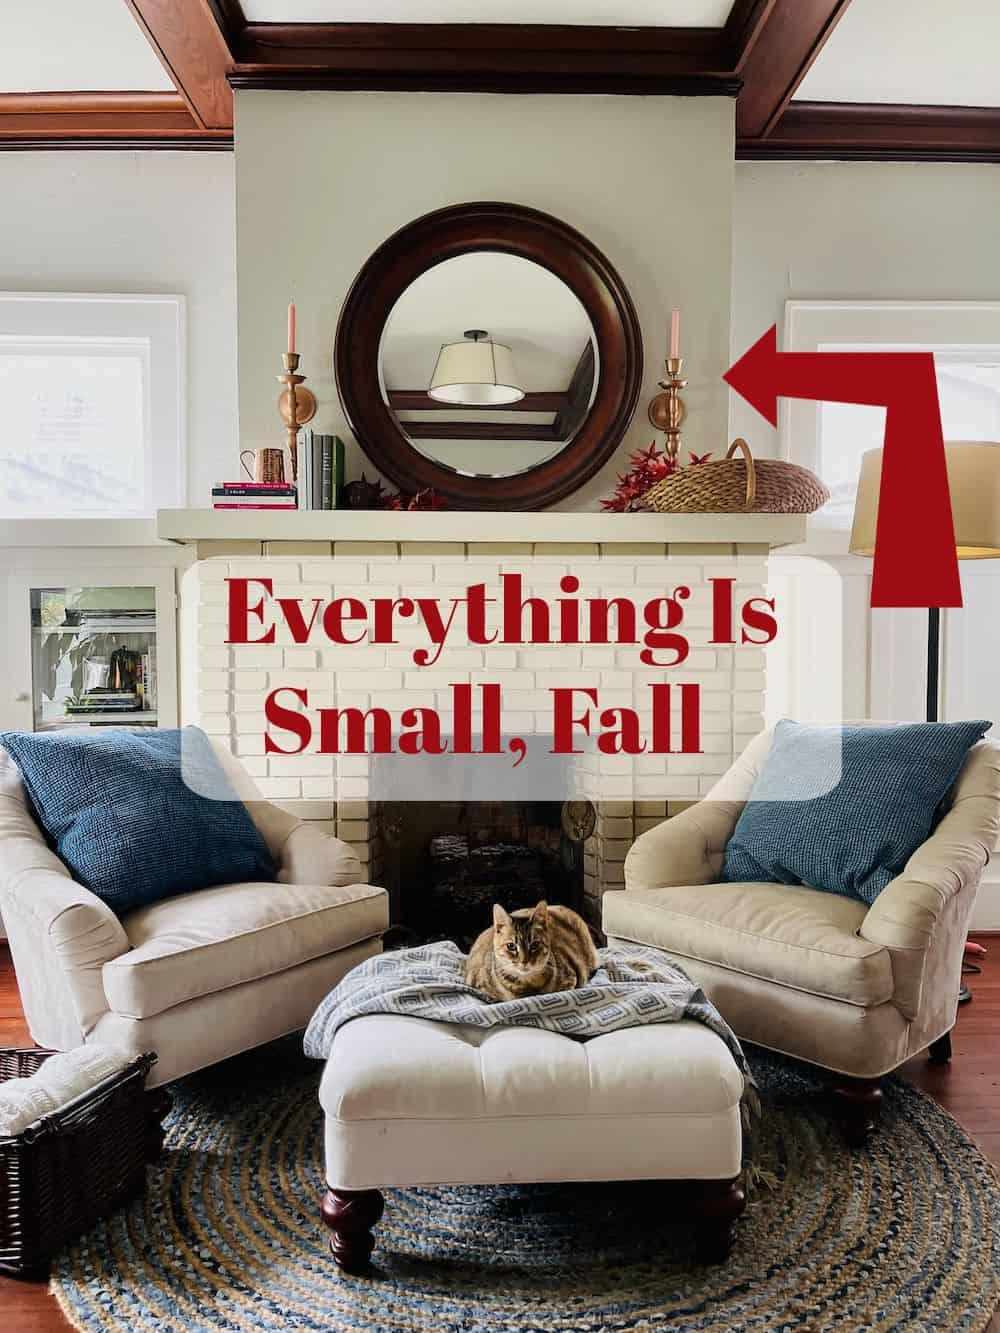 Adding a statement piece to fall decor